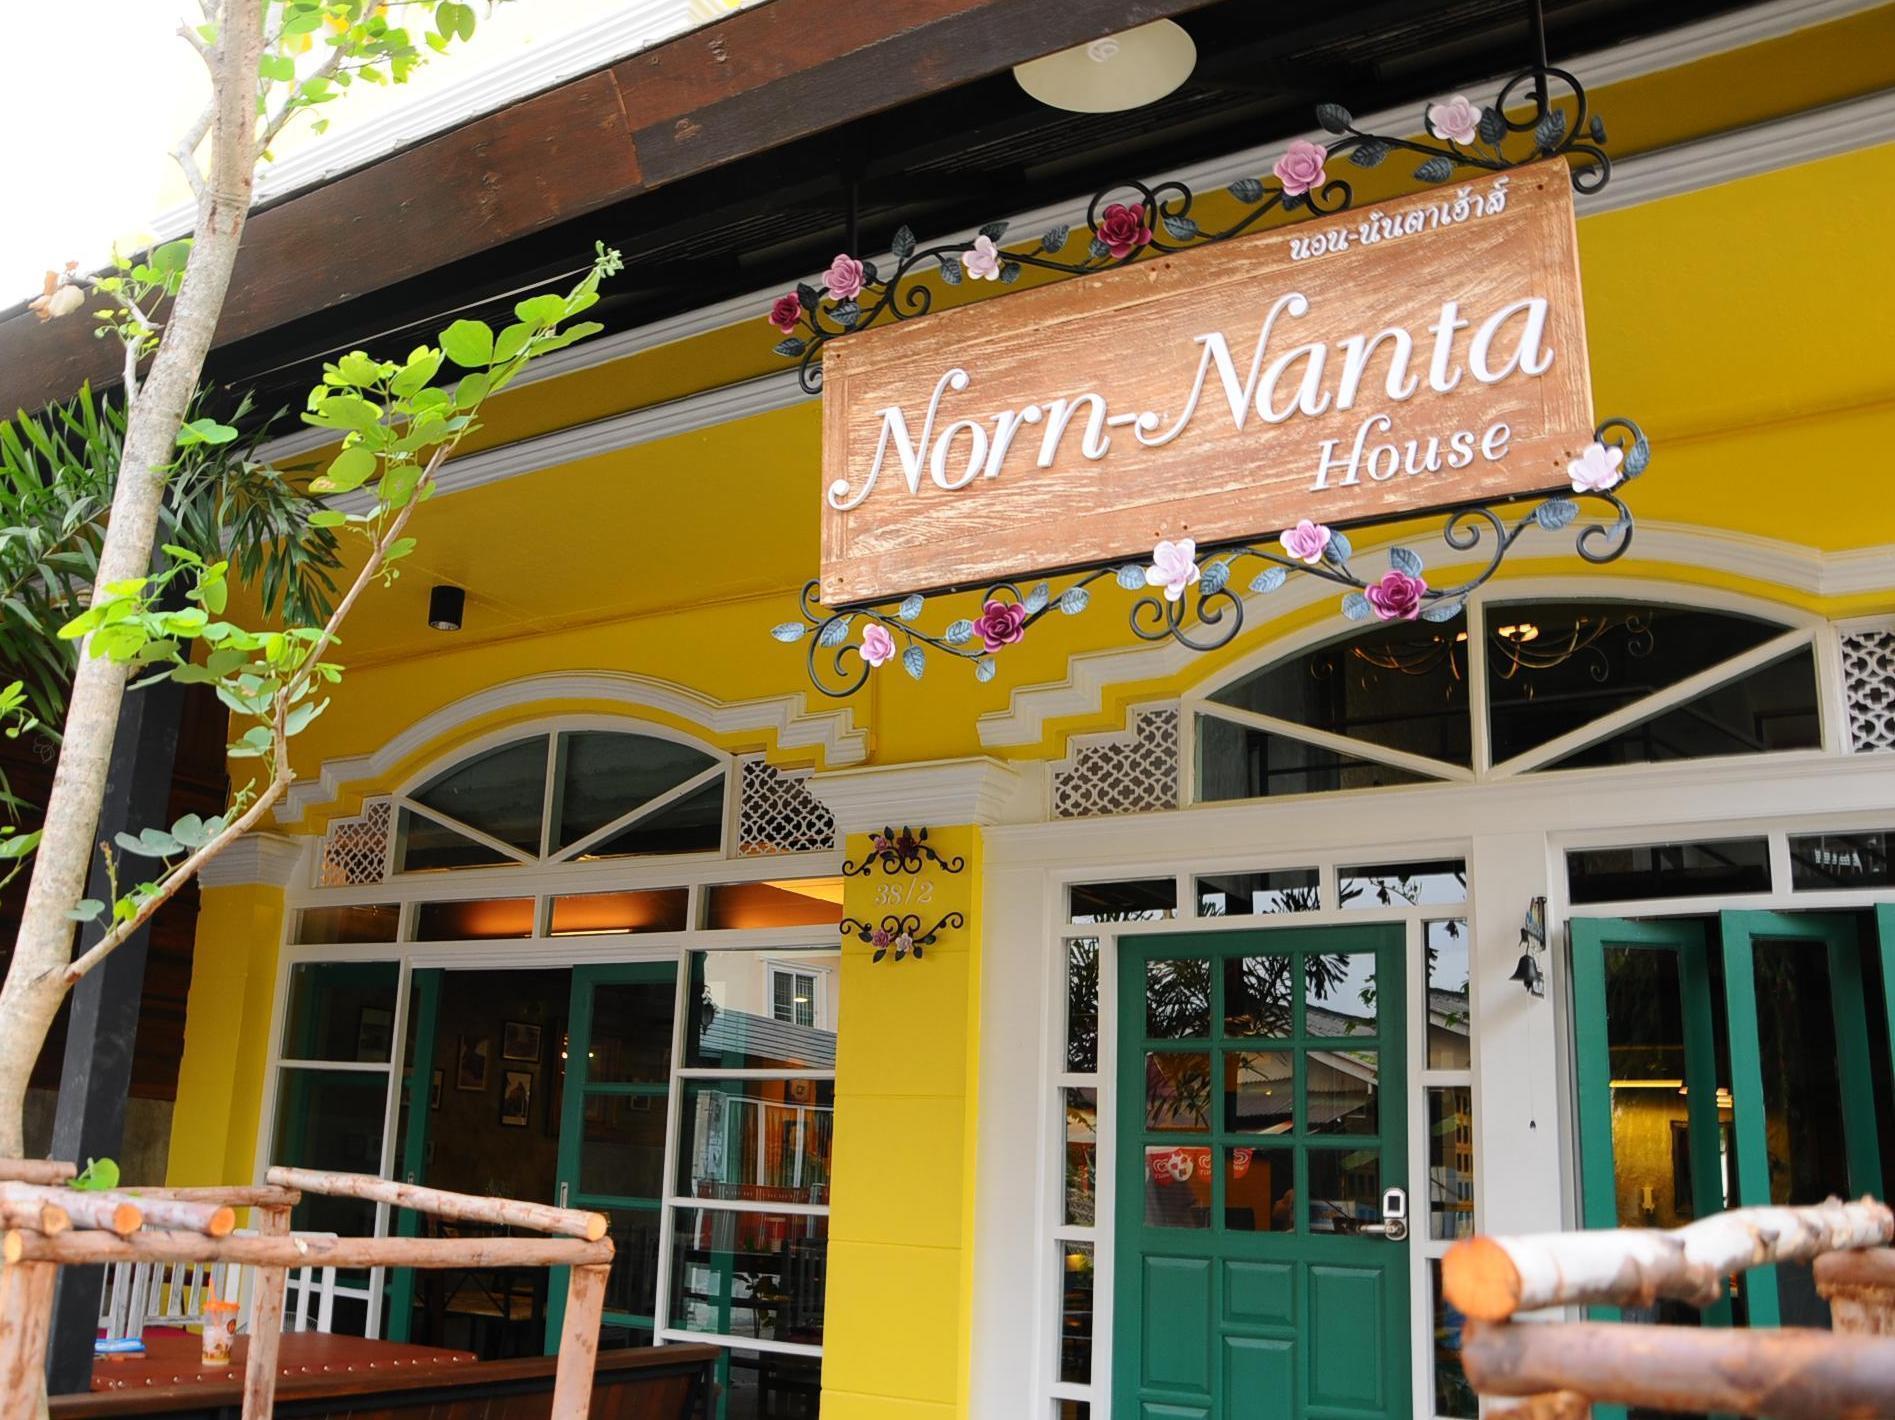 Norn-Nanta House นอนนันตา เฮ้าส์